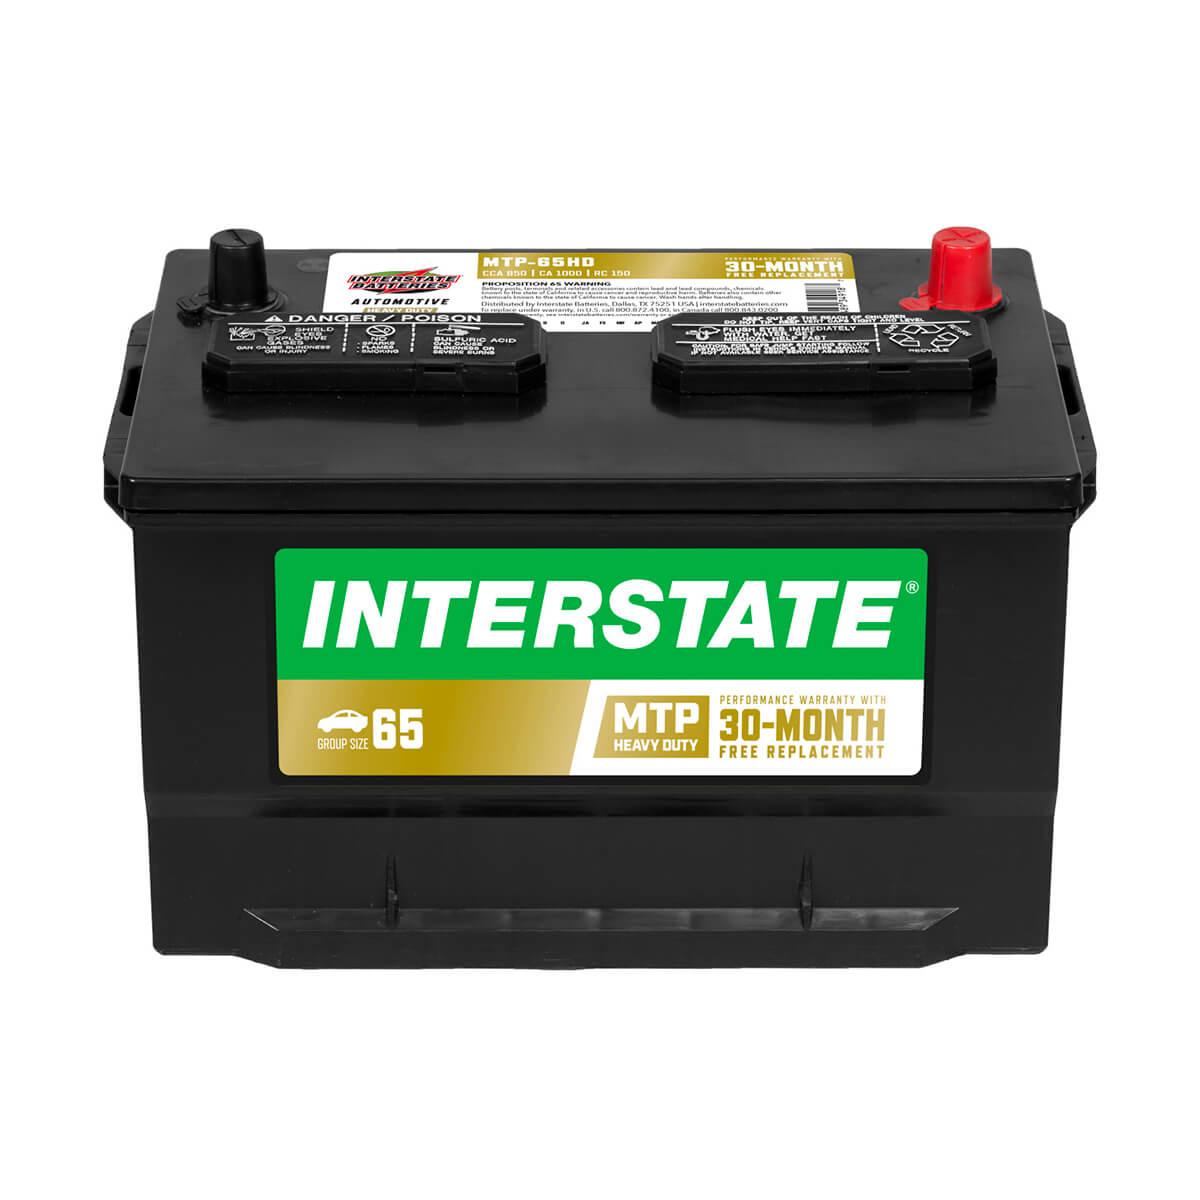 Interstate Auto/Truck/SUV Battery - MTP-65HD